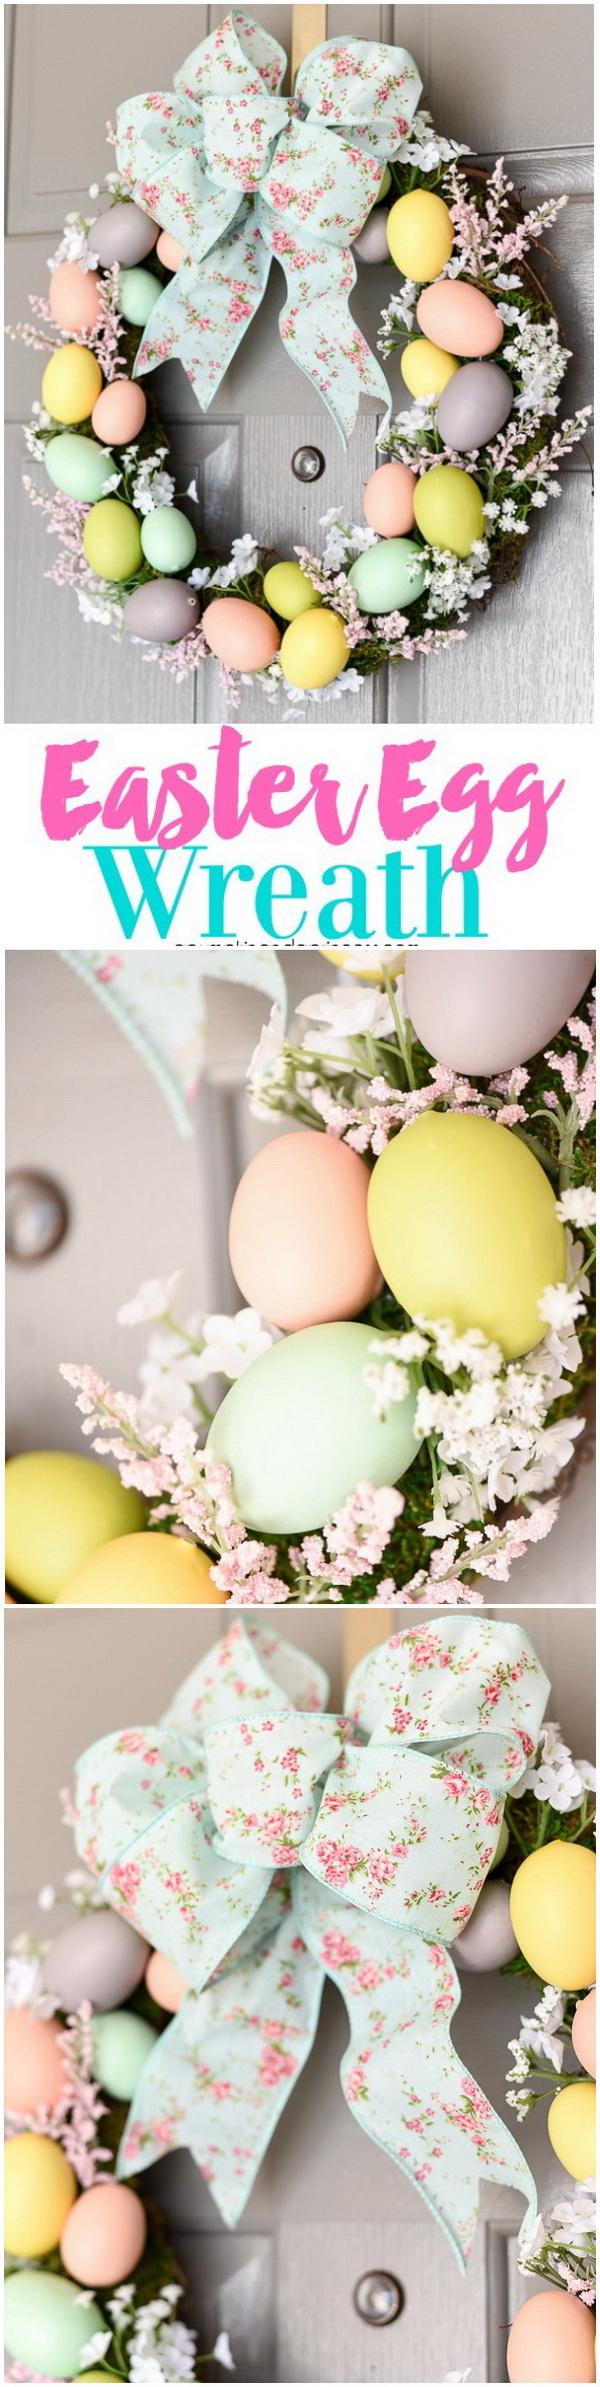 DIY Easter Decoration Ideas: DIY Easter Egg Wreath.